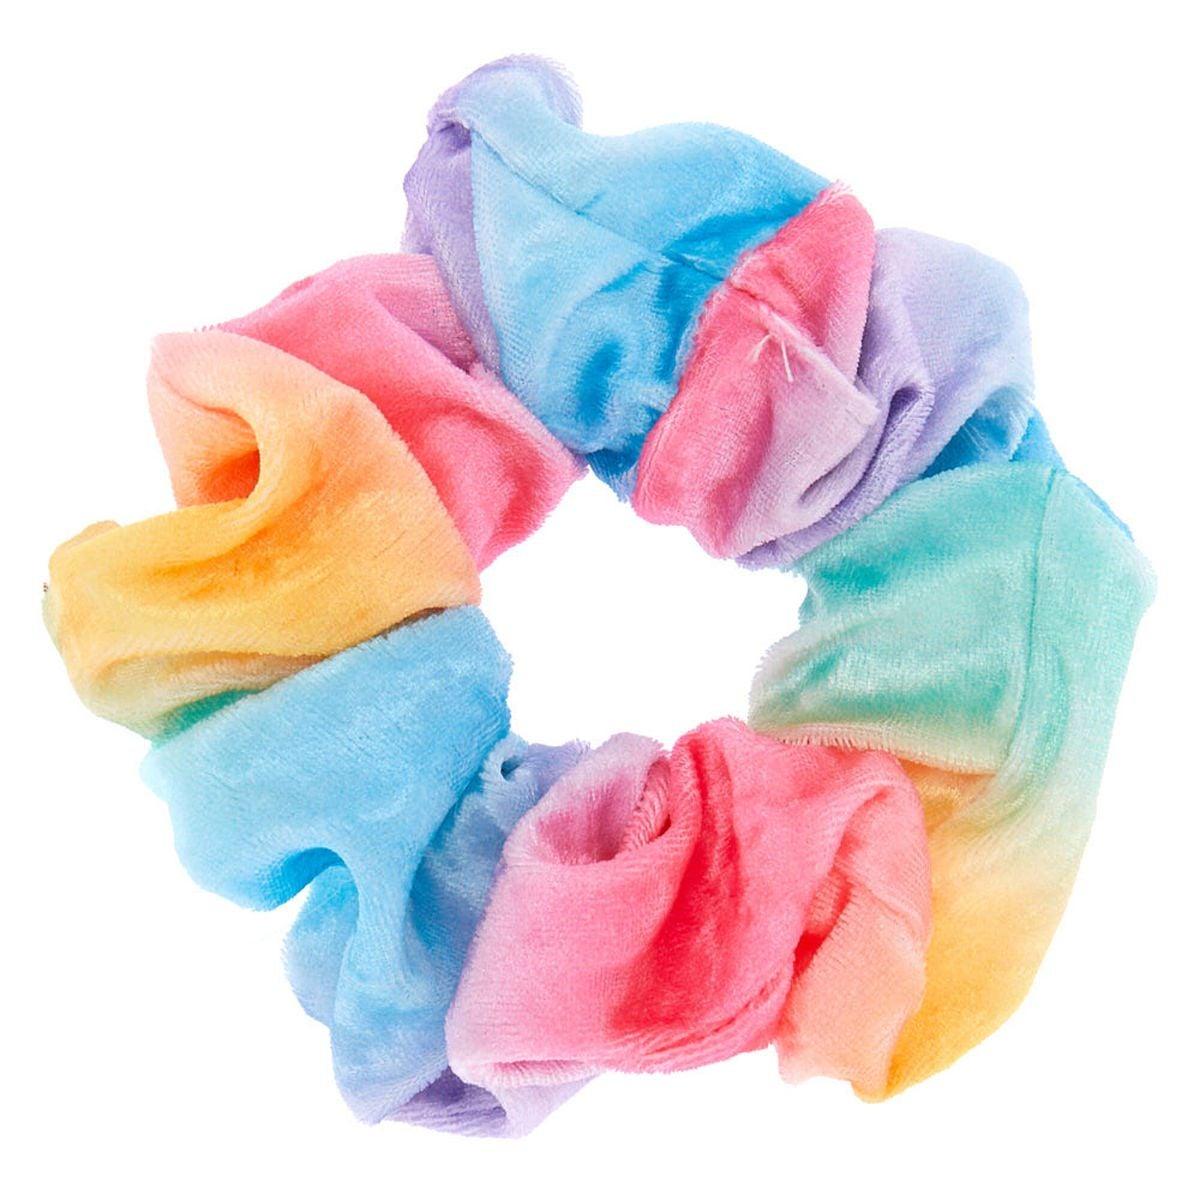 A rainbow scrunchie